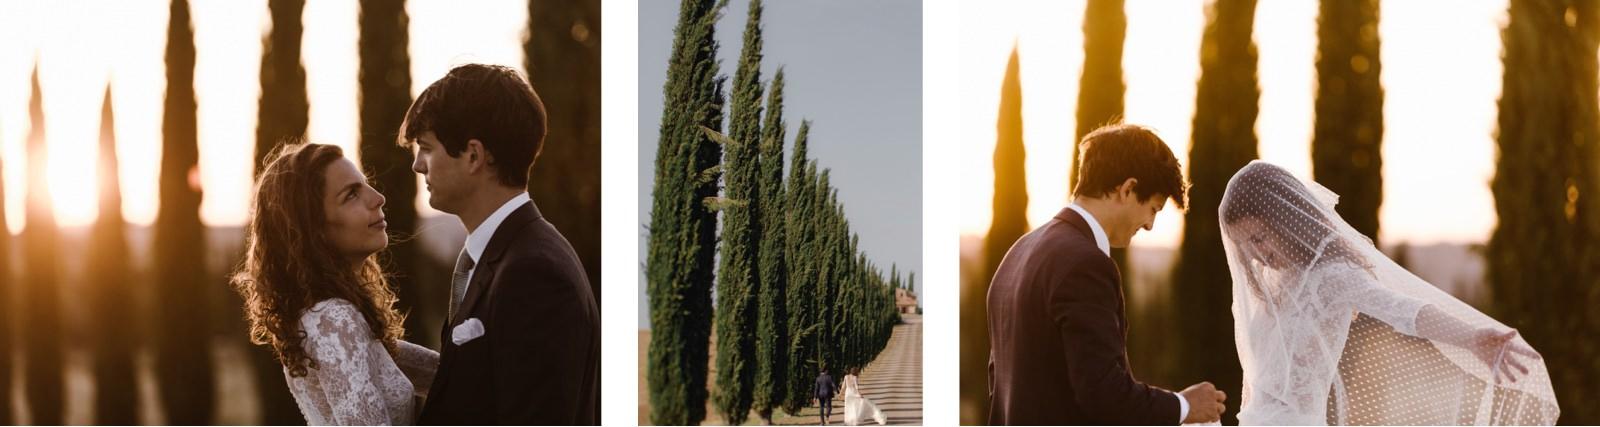 Fotomagoria Tuscany Wedding Photographer 25.jpg